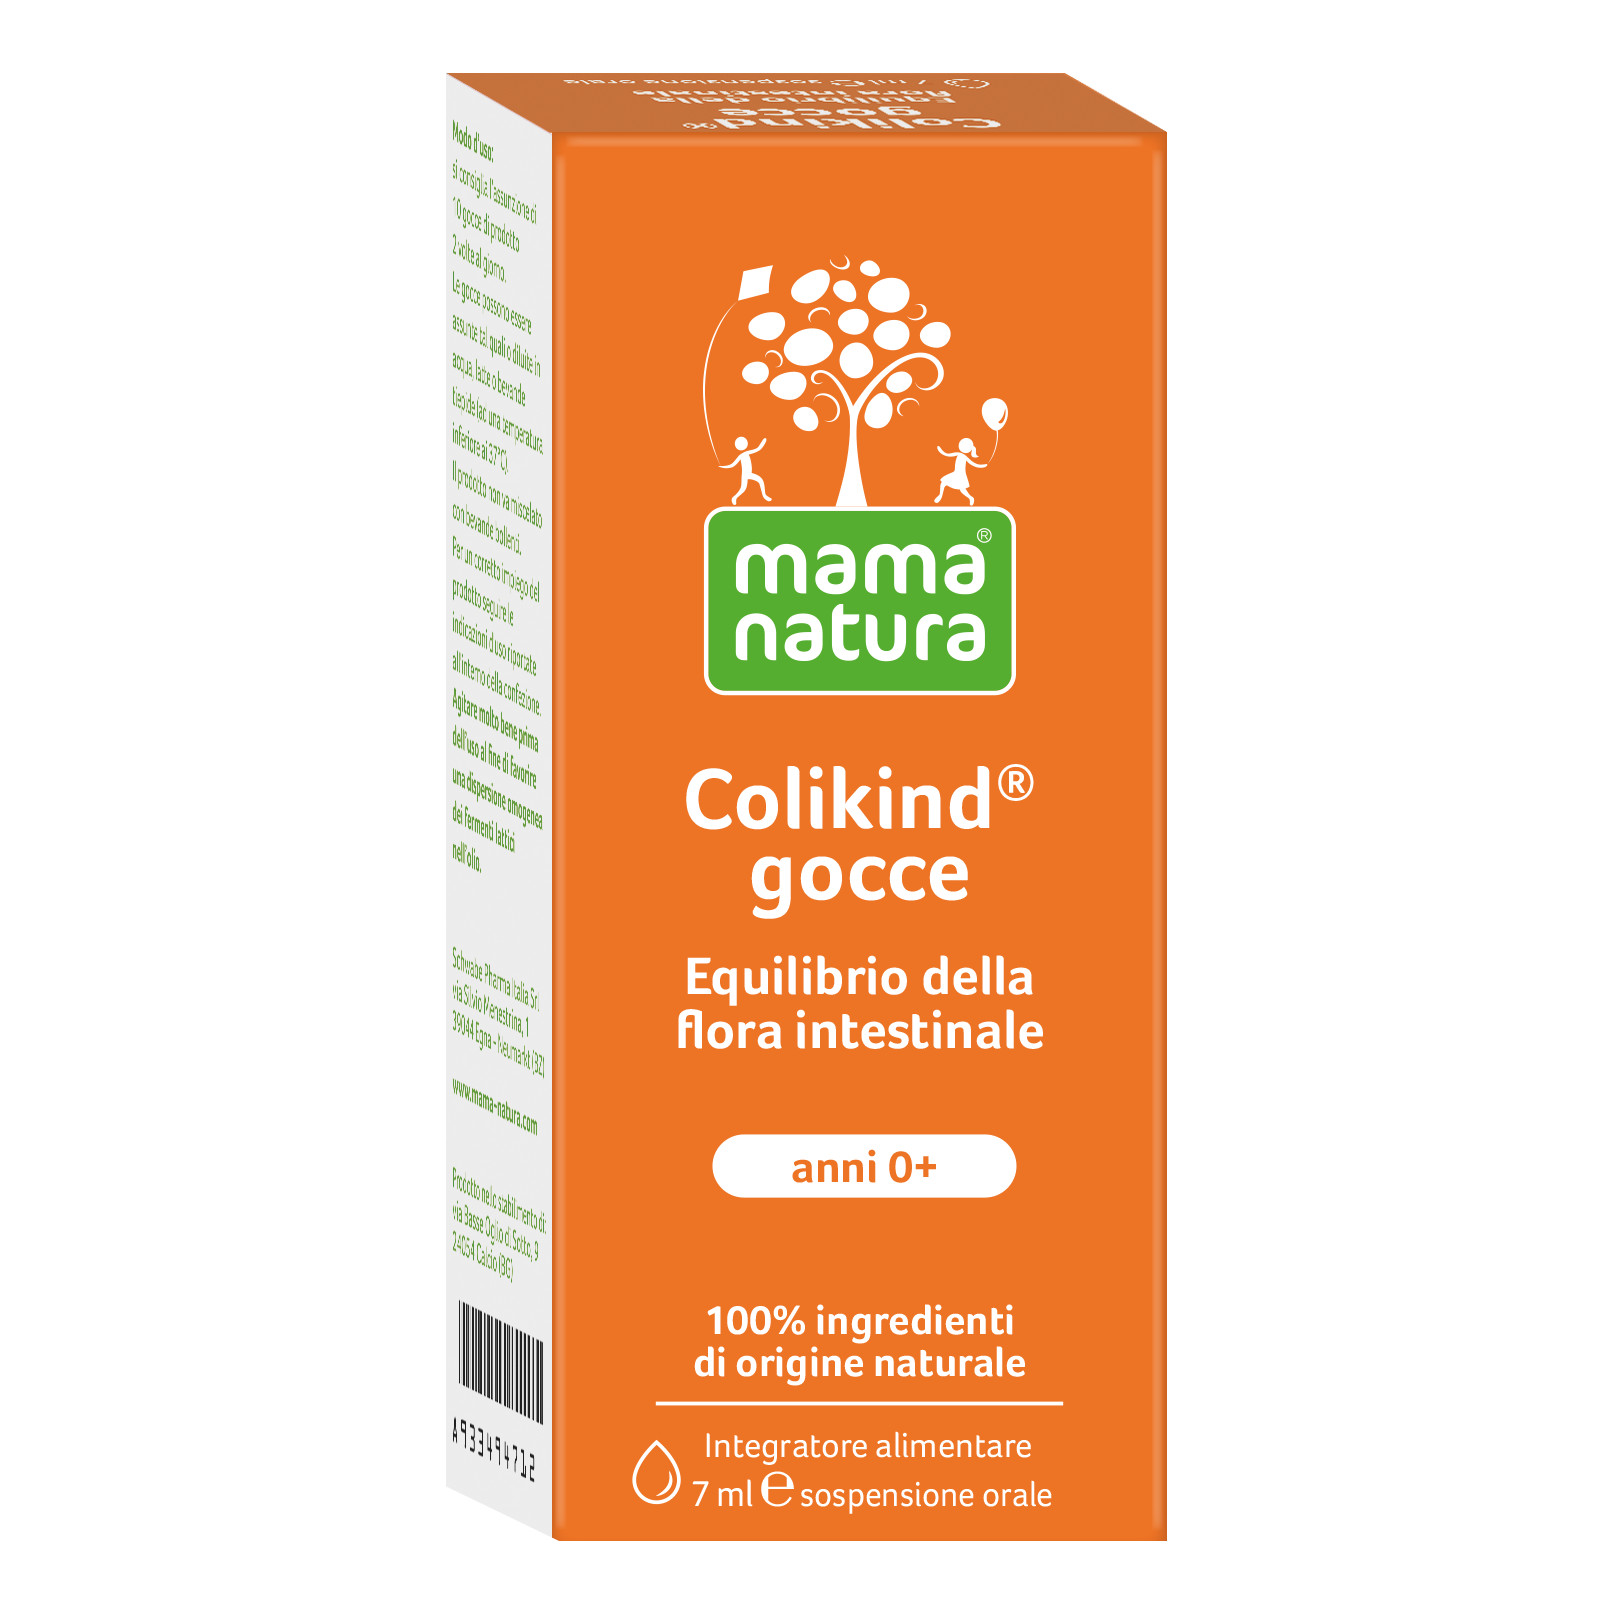 schwabe pharma italia srl colikind equilibrio flora intestinale gocce 7 ml